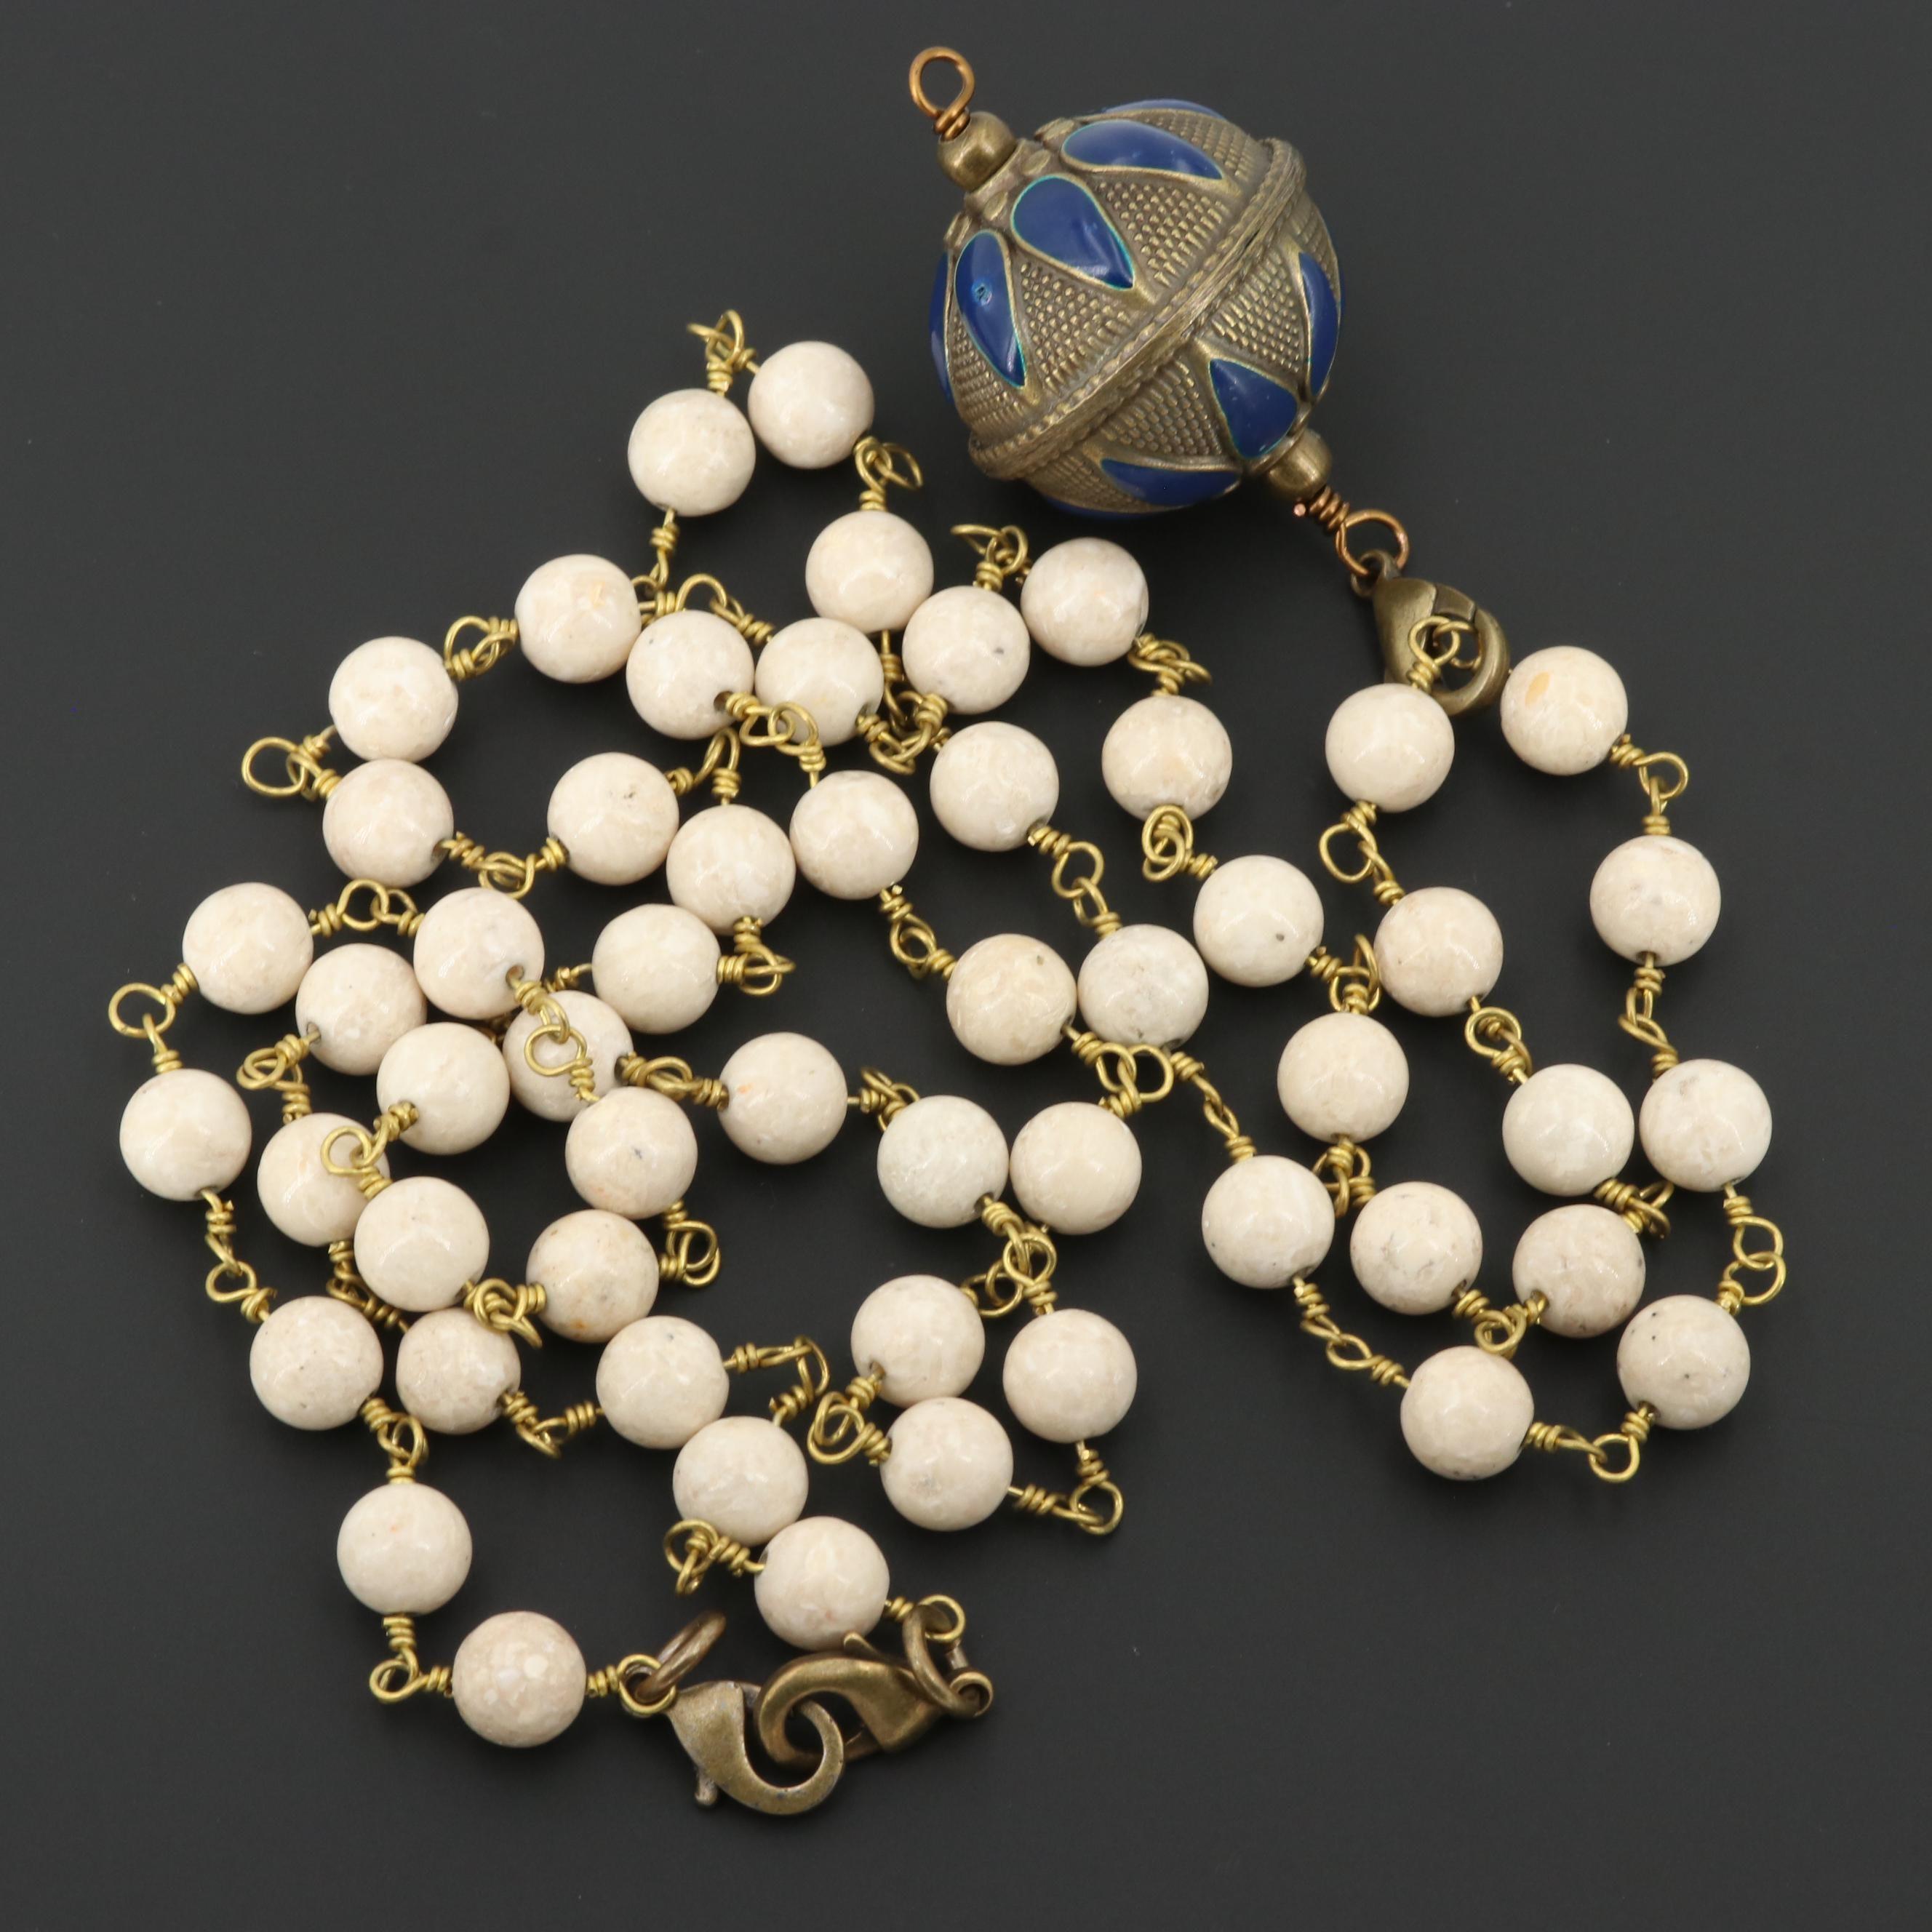 Gold Tone Feldspar and Enamel Beaded Necklace with Detachable Pendant